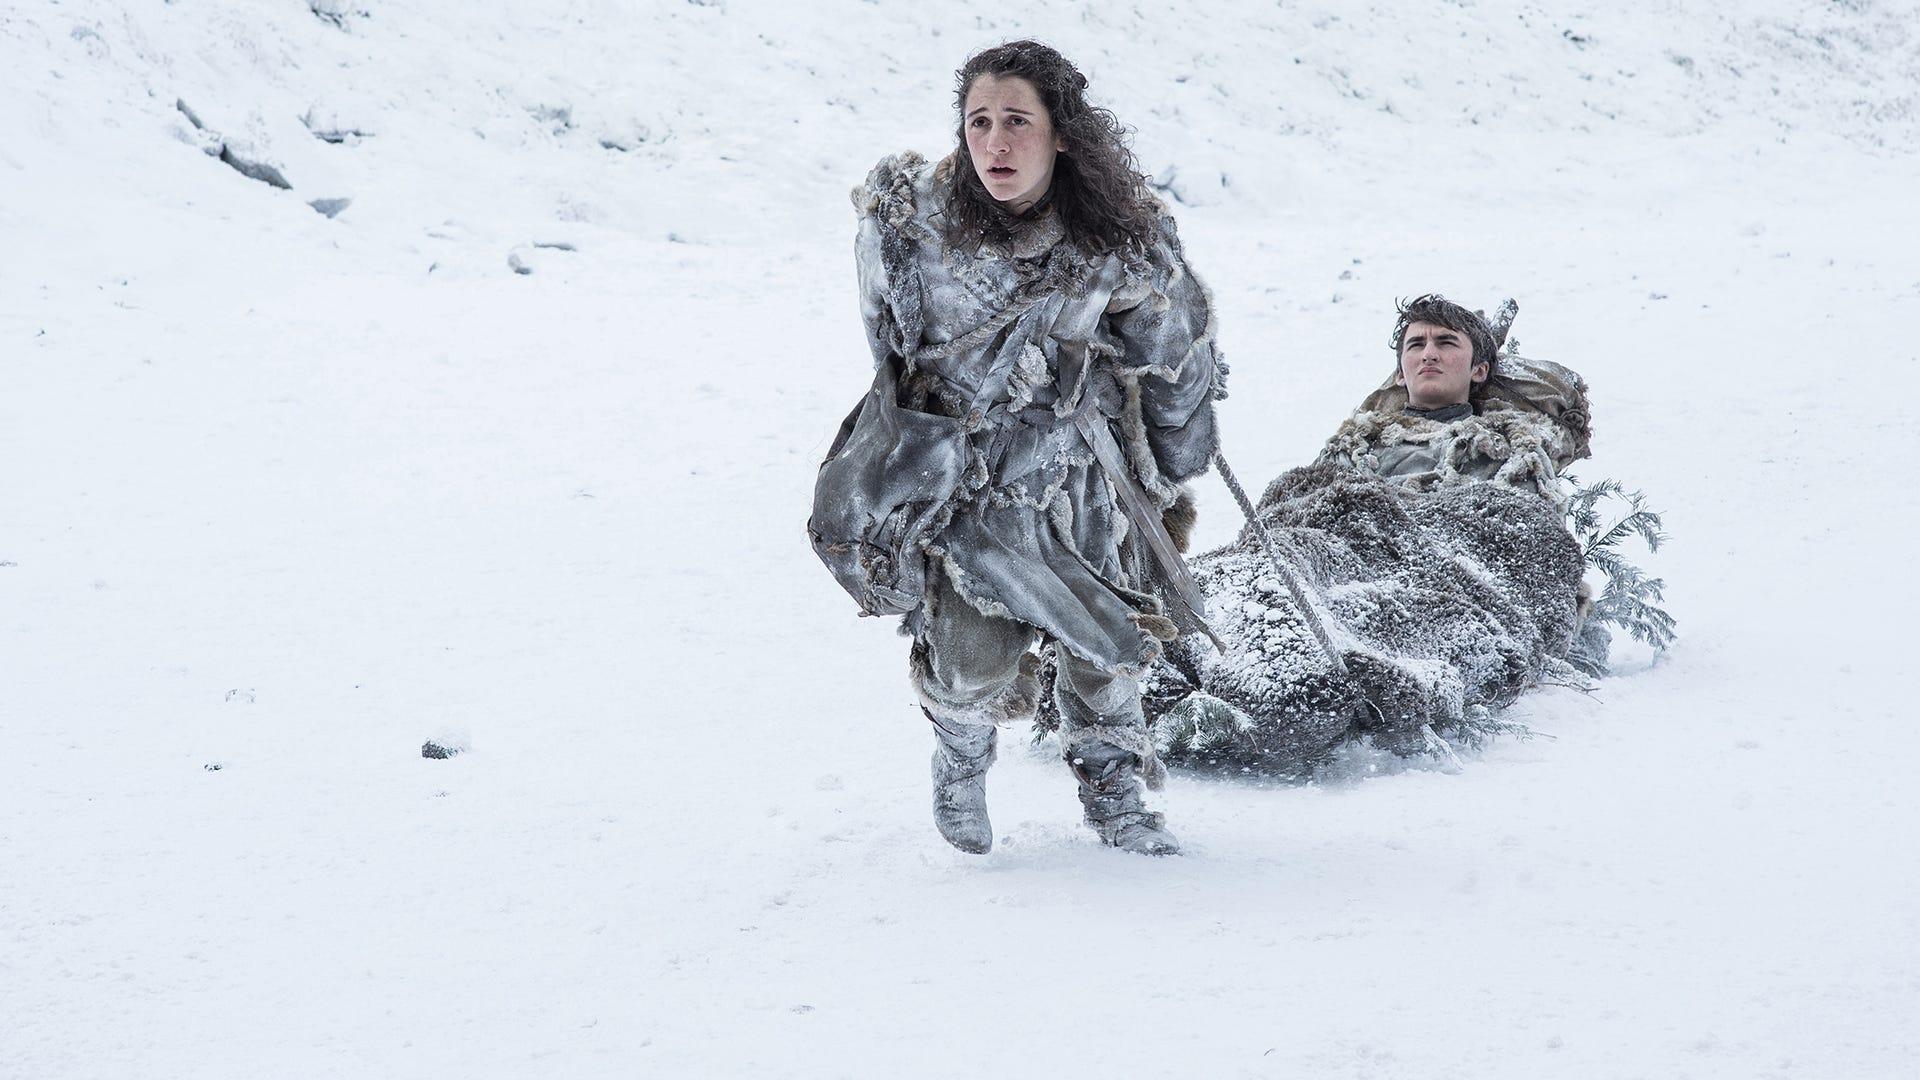 Ellie Kendrick, Isaac Hempstead Wright; Game of Thrones